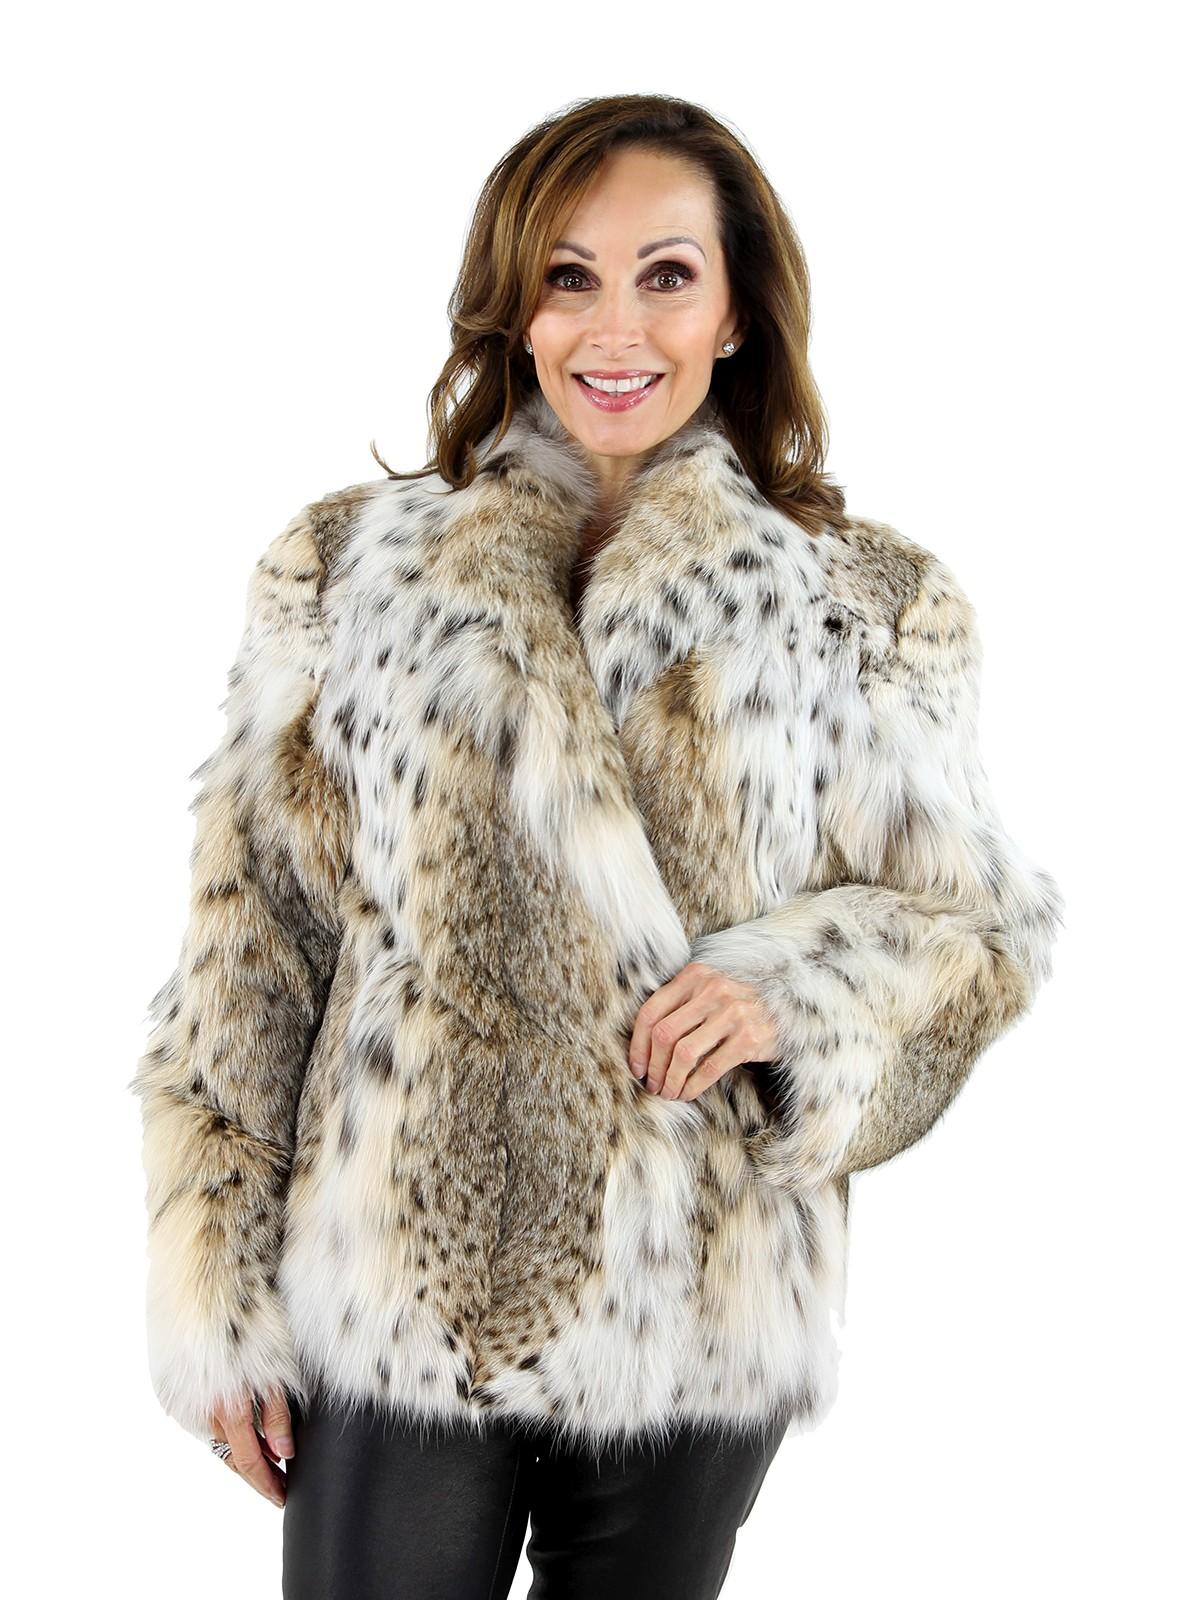 Mink Coat Value >> Lynx Fur Coat - Women's XLarge   Estate Furs